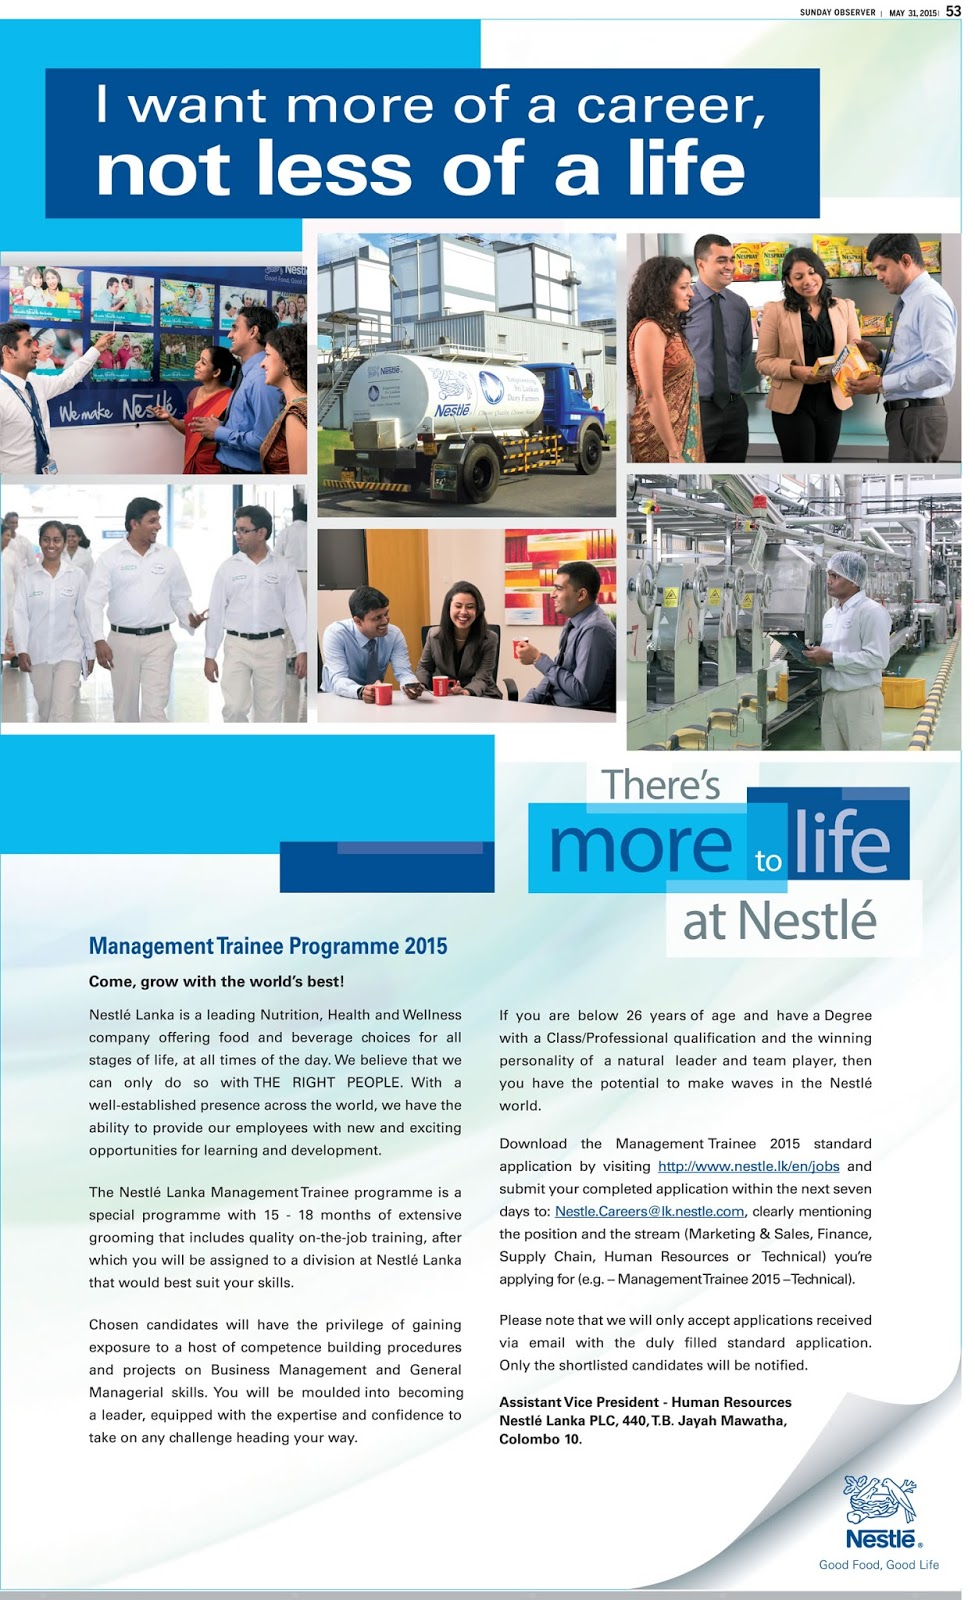 sri lanka vacancies latest vacancies career opportunities management trainee